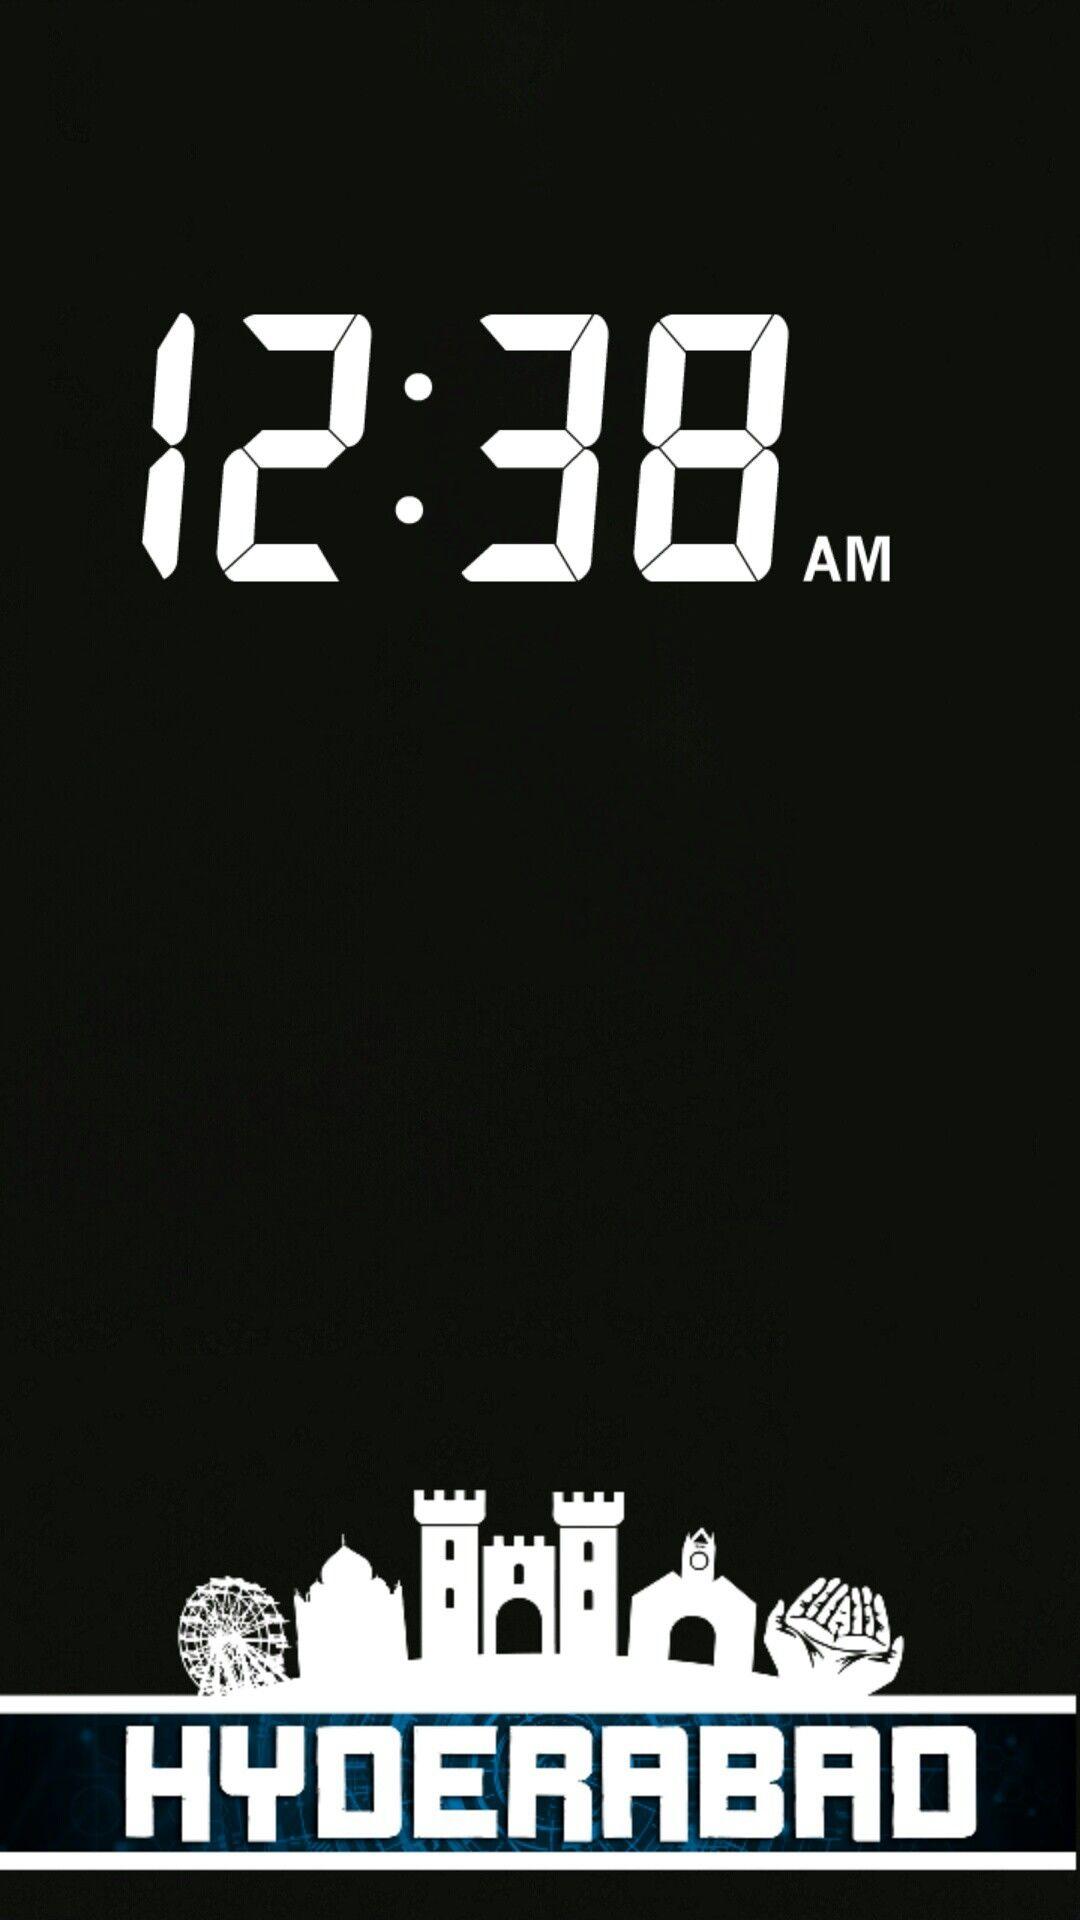 Pin by Azhar alee on snap | Alarm clock, Digital alarm clock, Clock